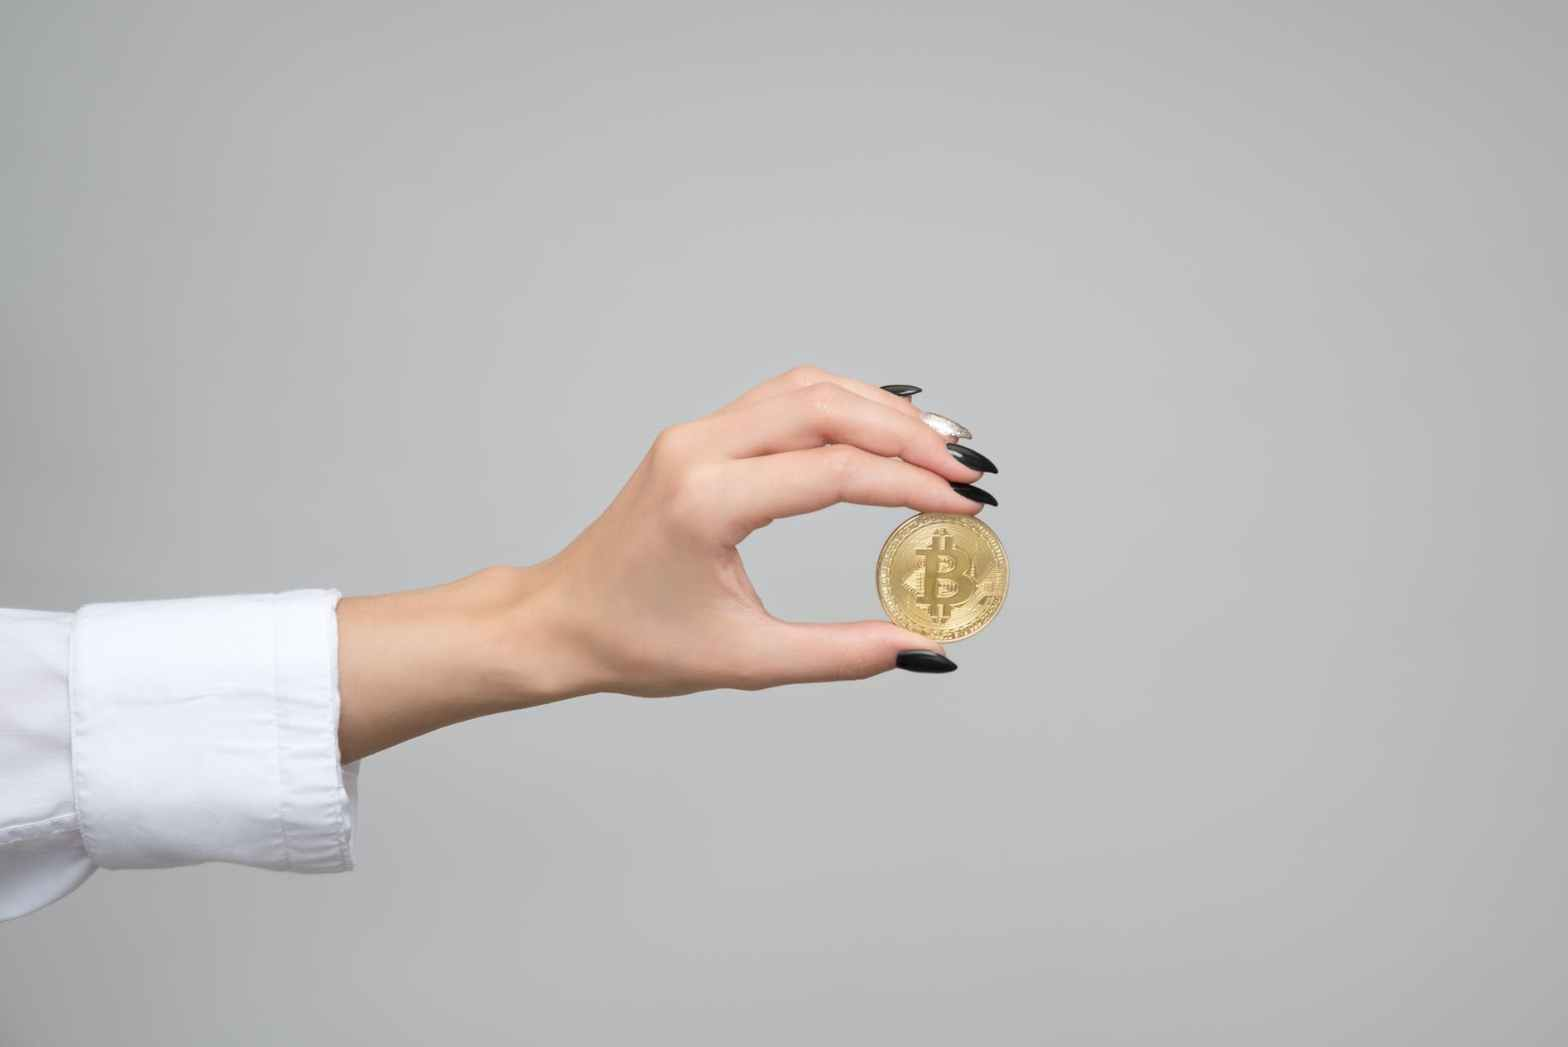 woman holding a bitcoin